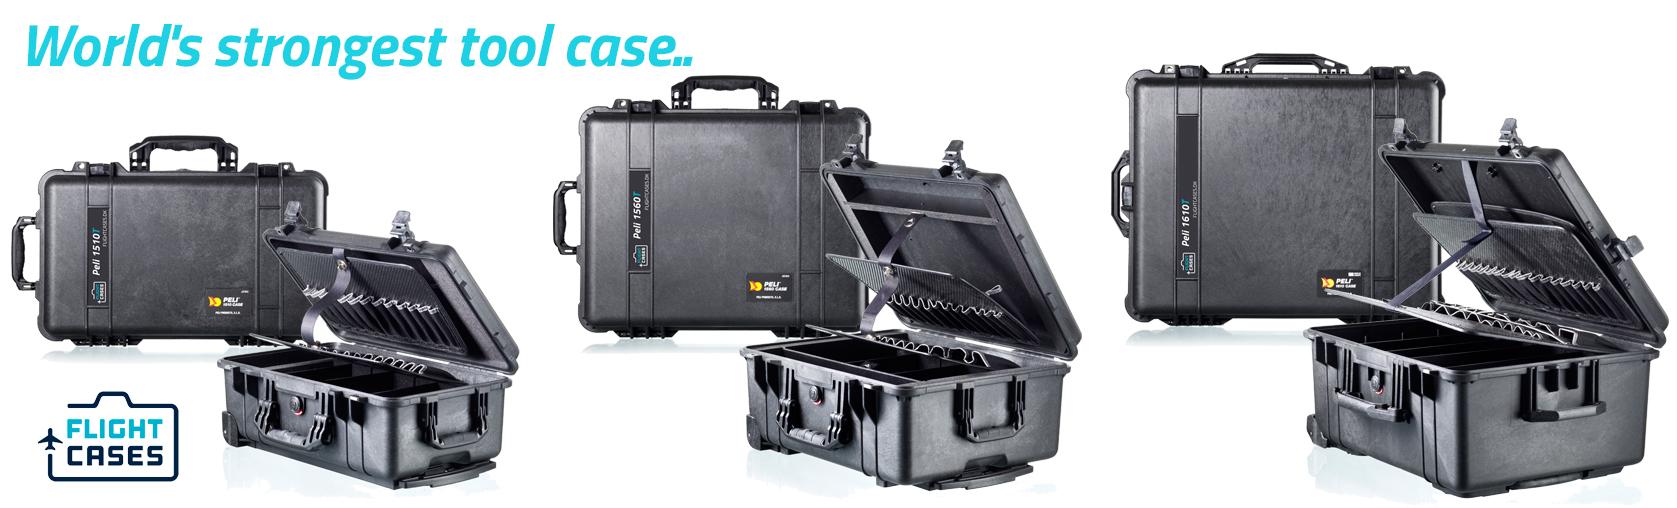 Peli Tool Cases Lineup